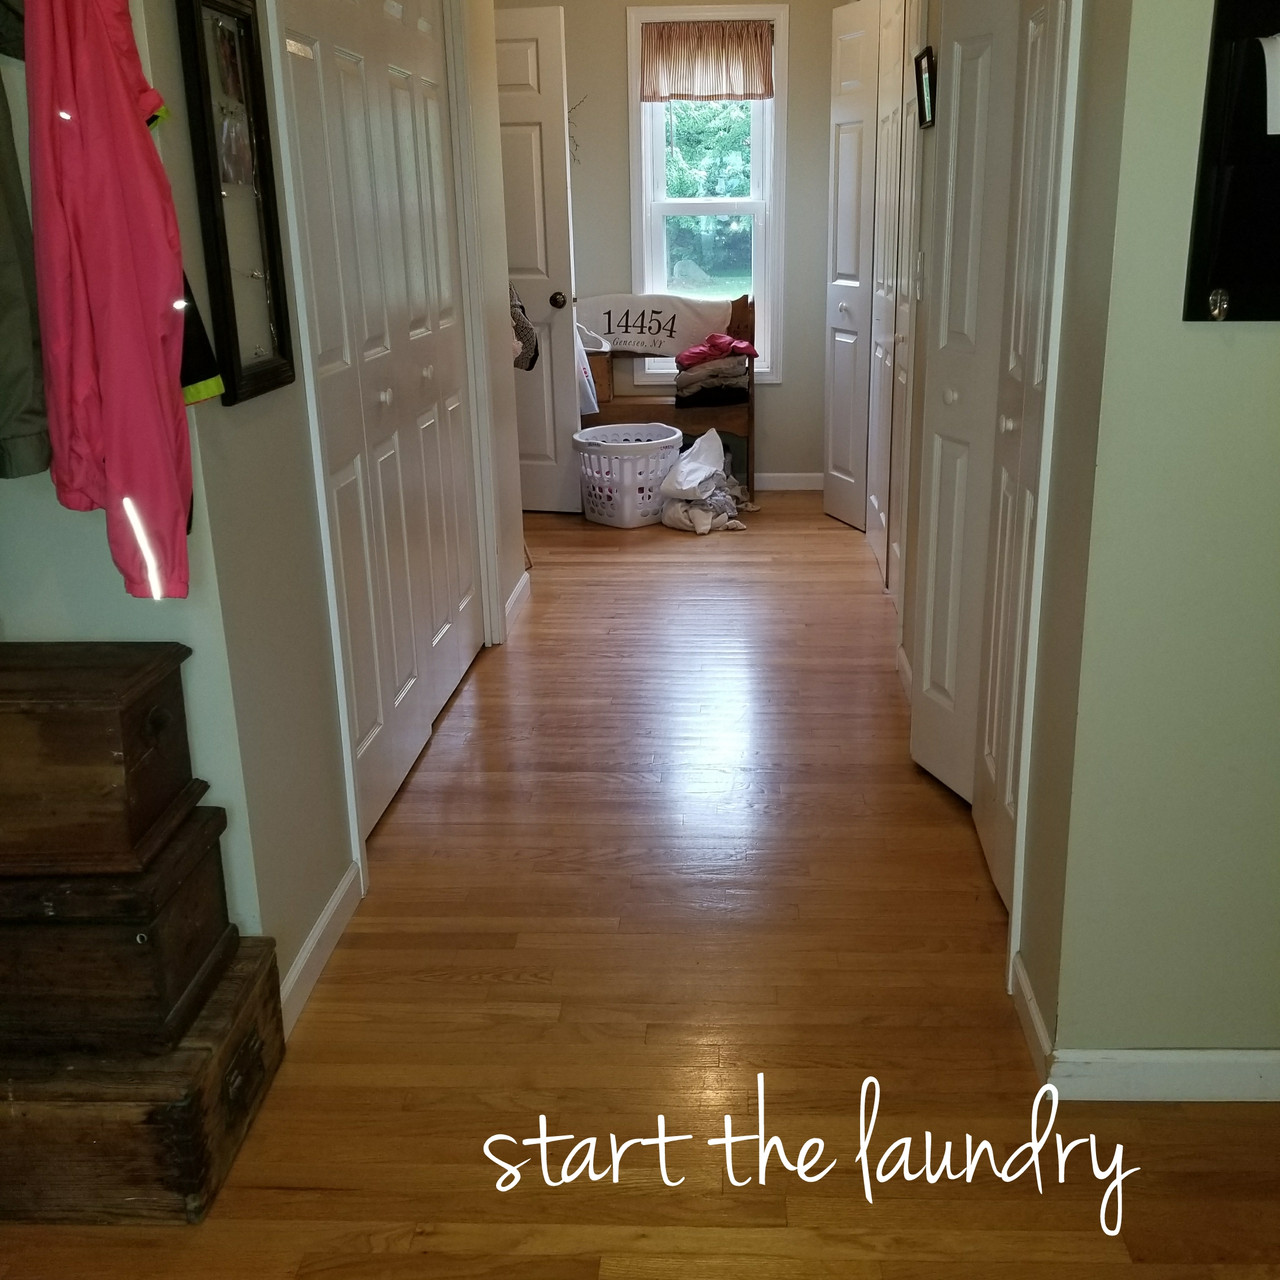 Start the Laundry